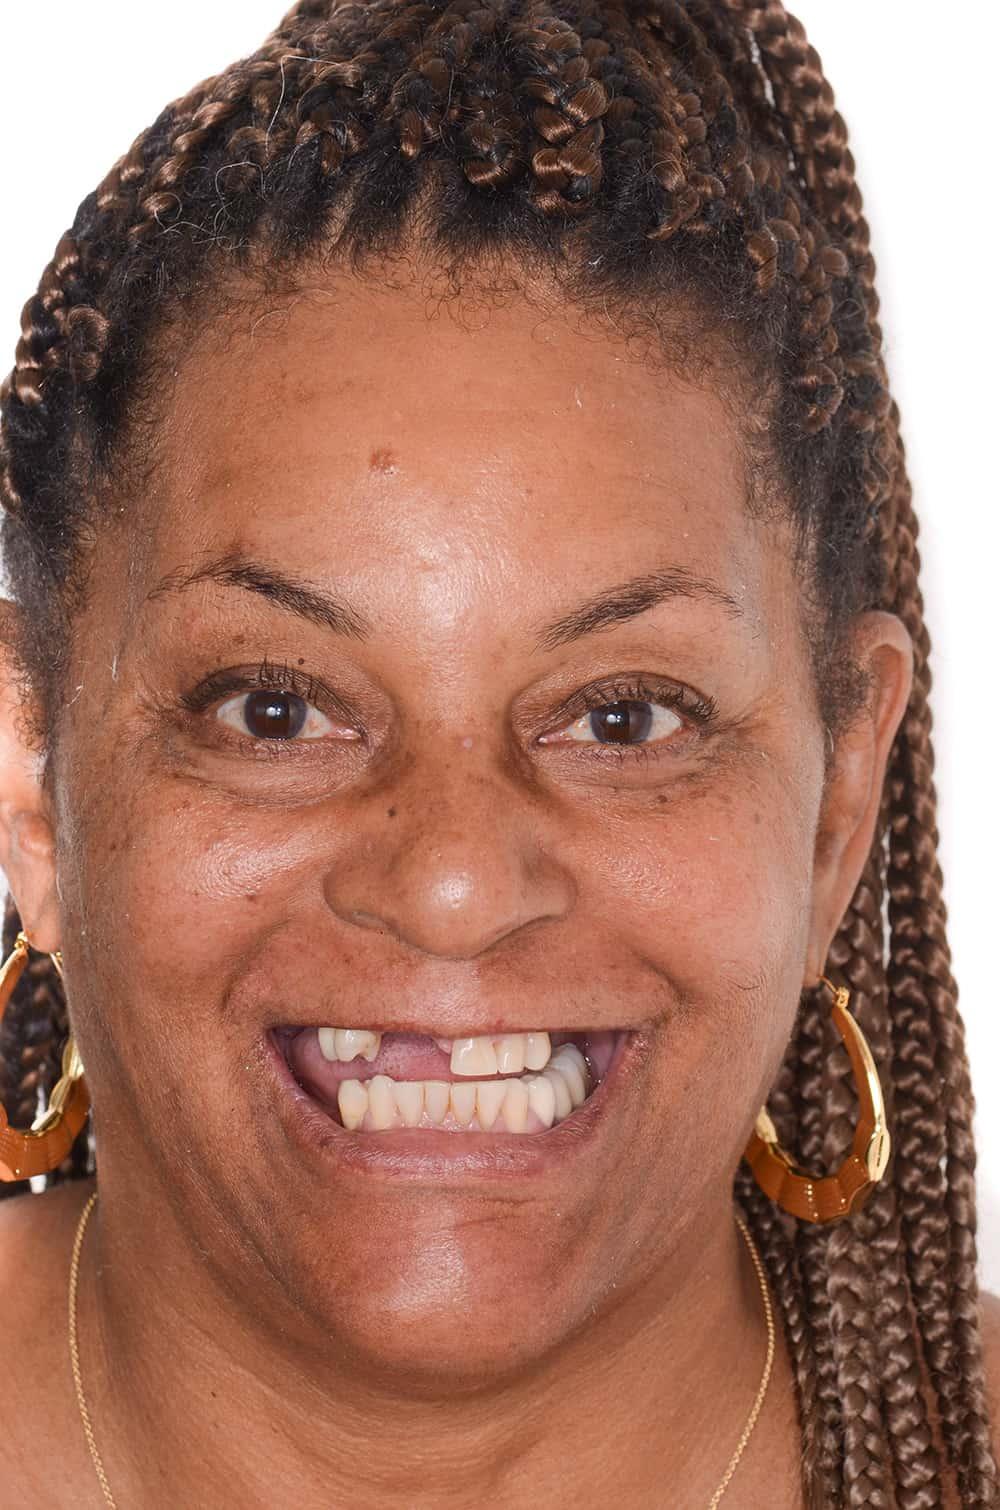 ArtLab Dentistry patient before dental implants restoration